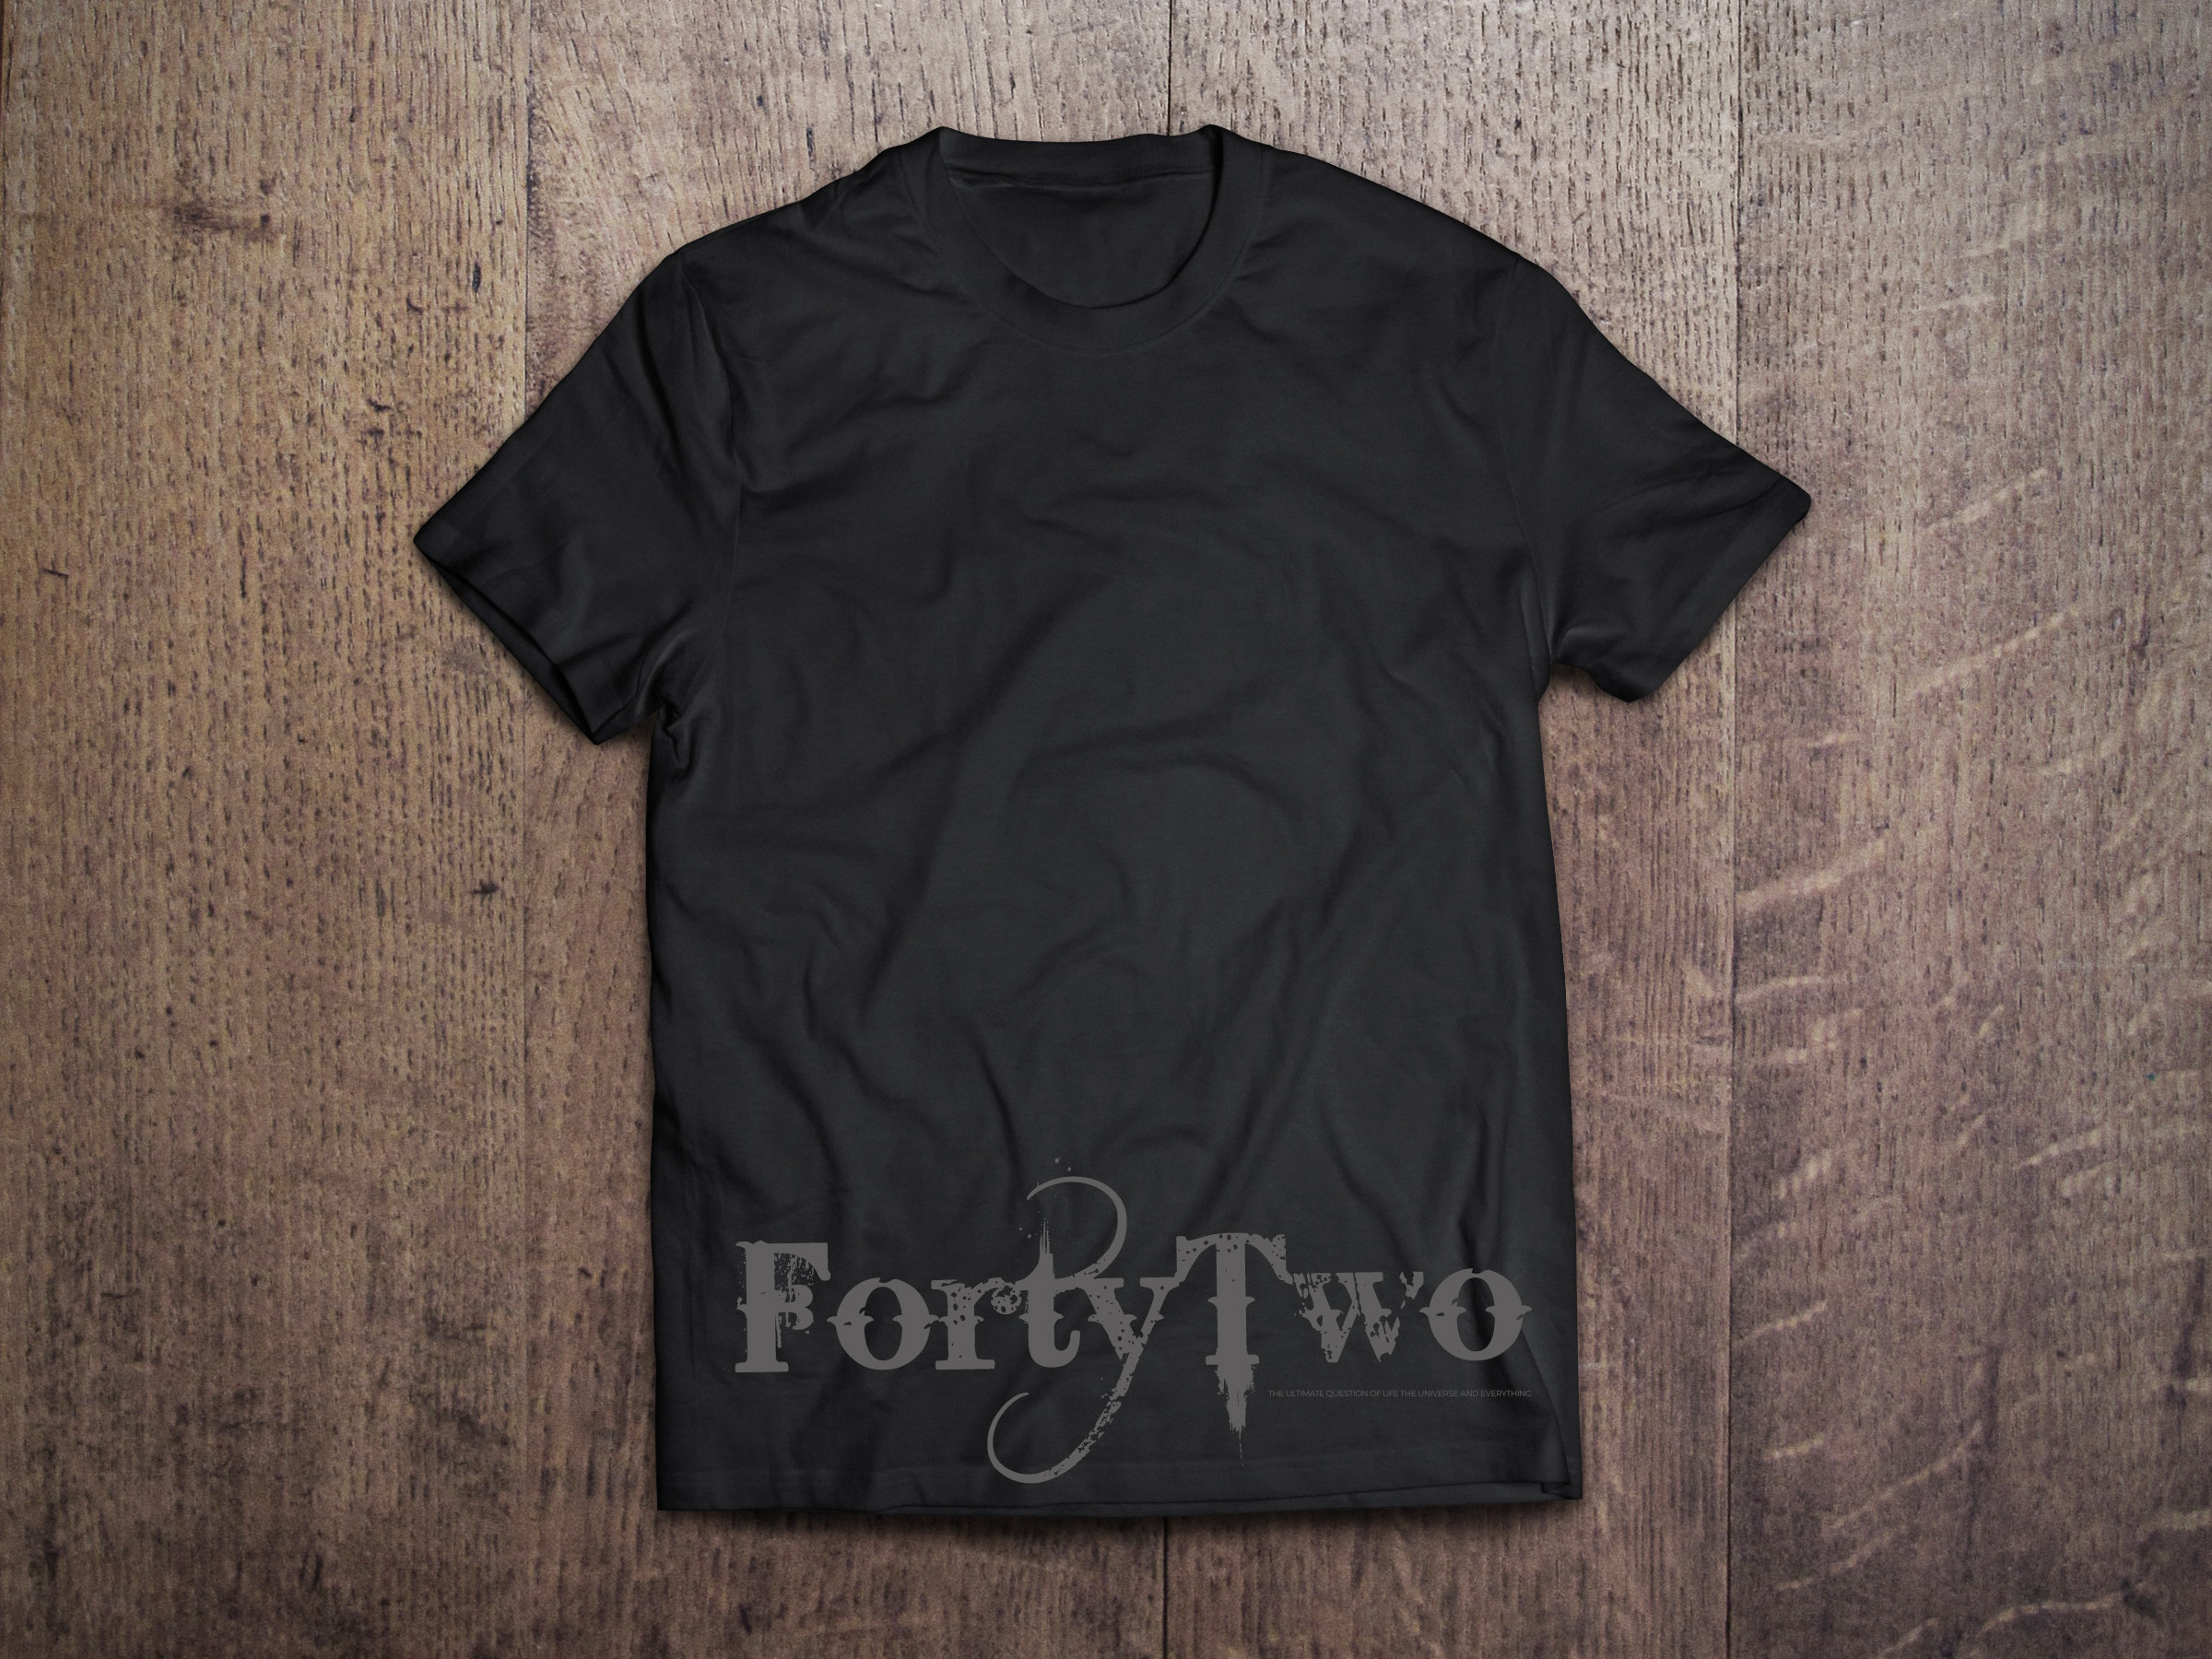 42 Bleeding Cowboys Bottom 42 Bleeding Cowboy Bottom Tshirt